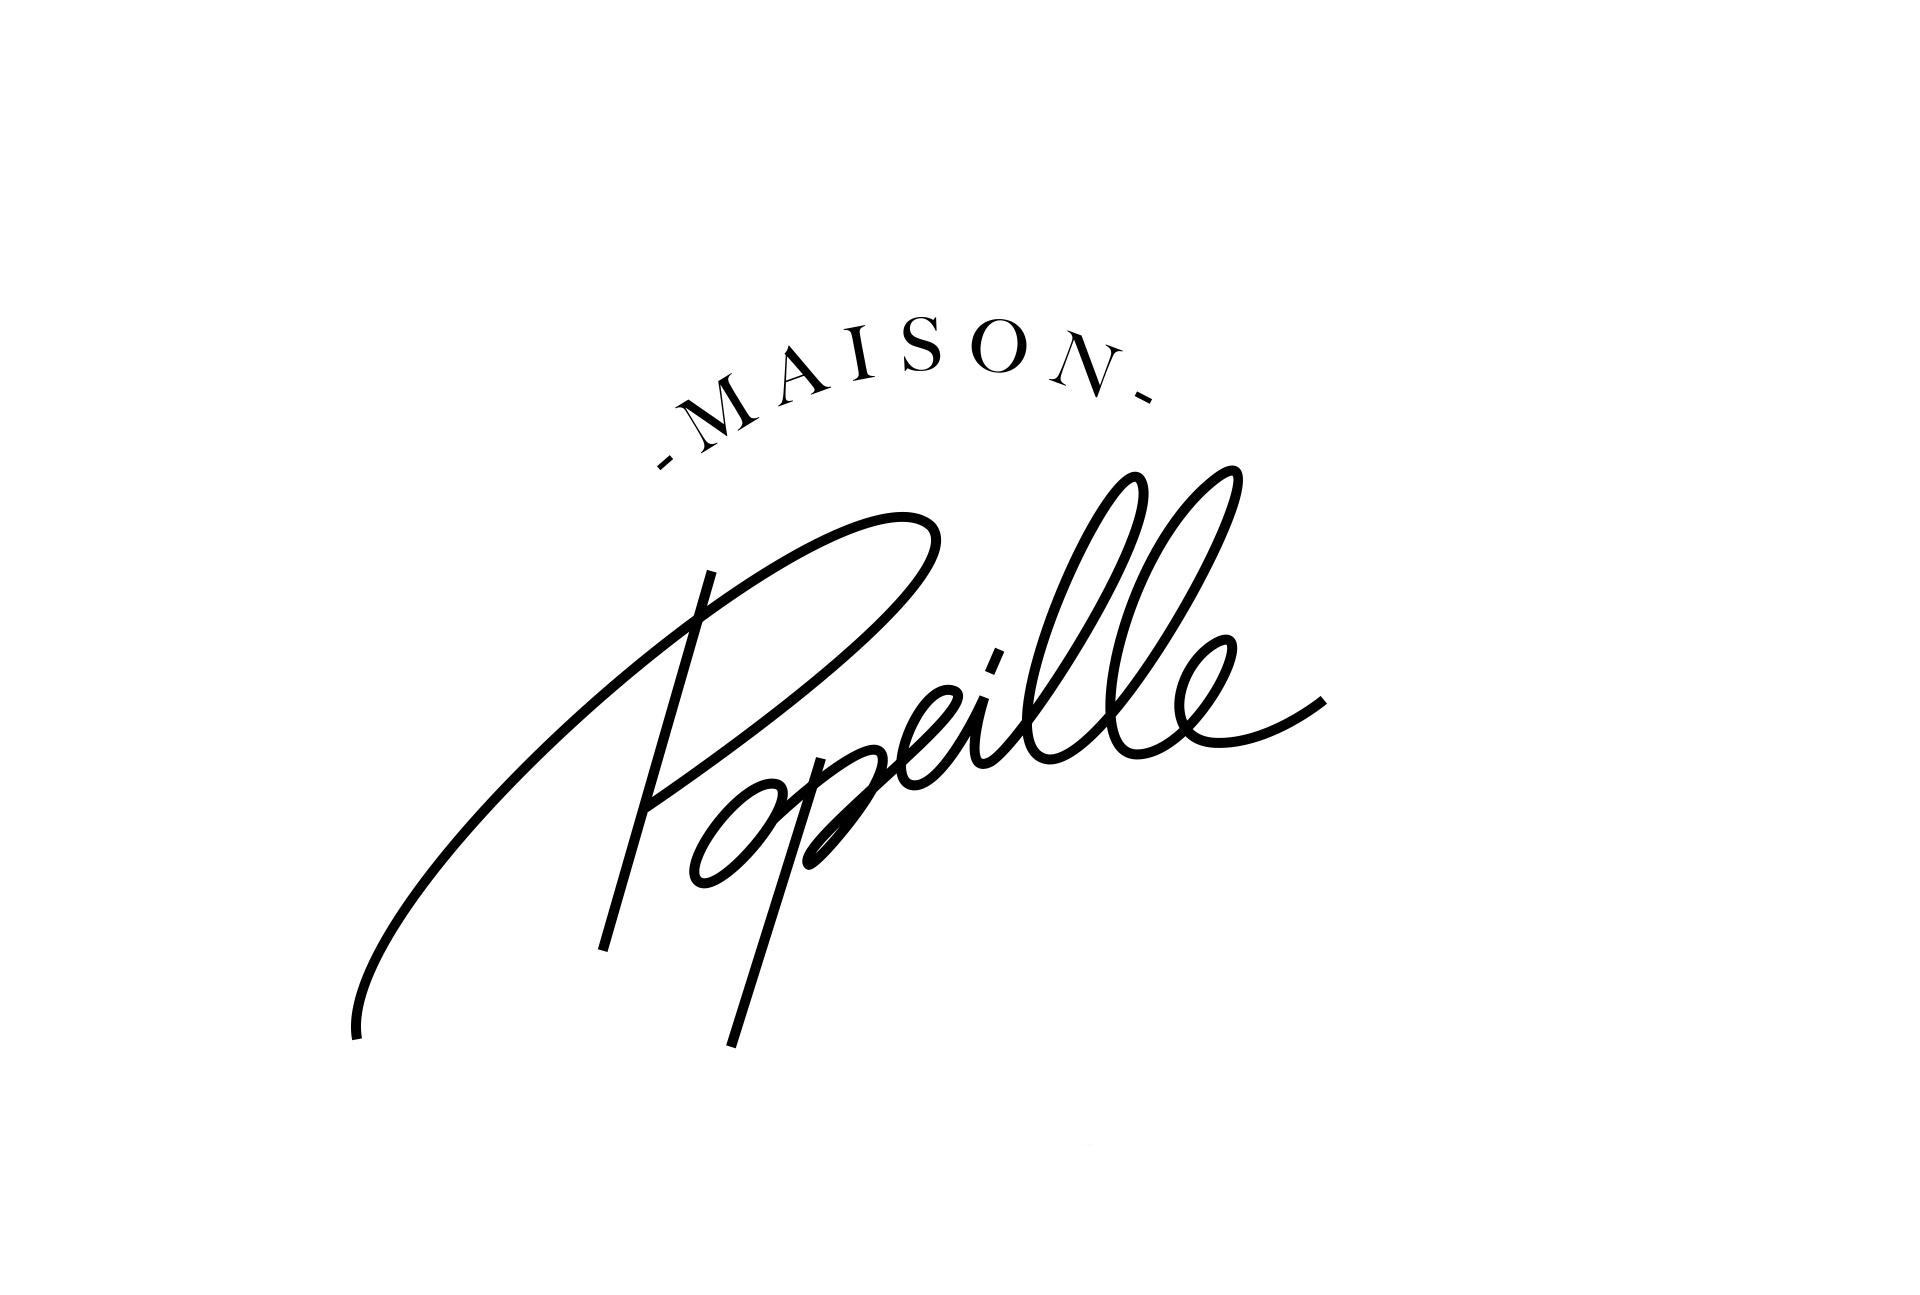 MAISON POPEILLE